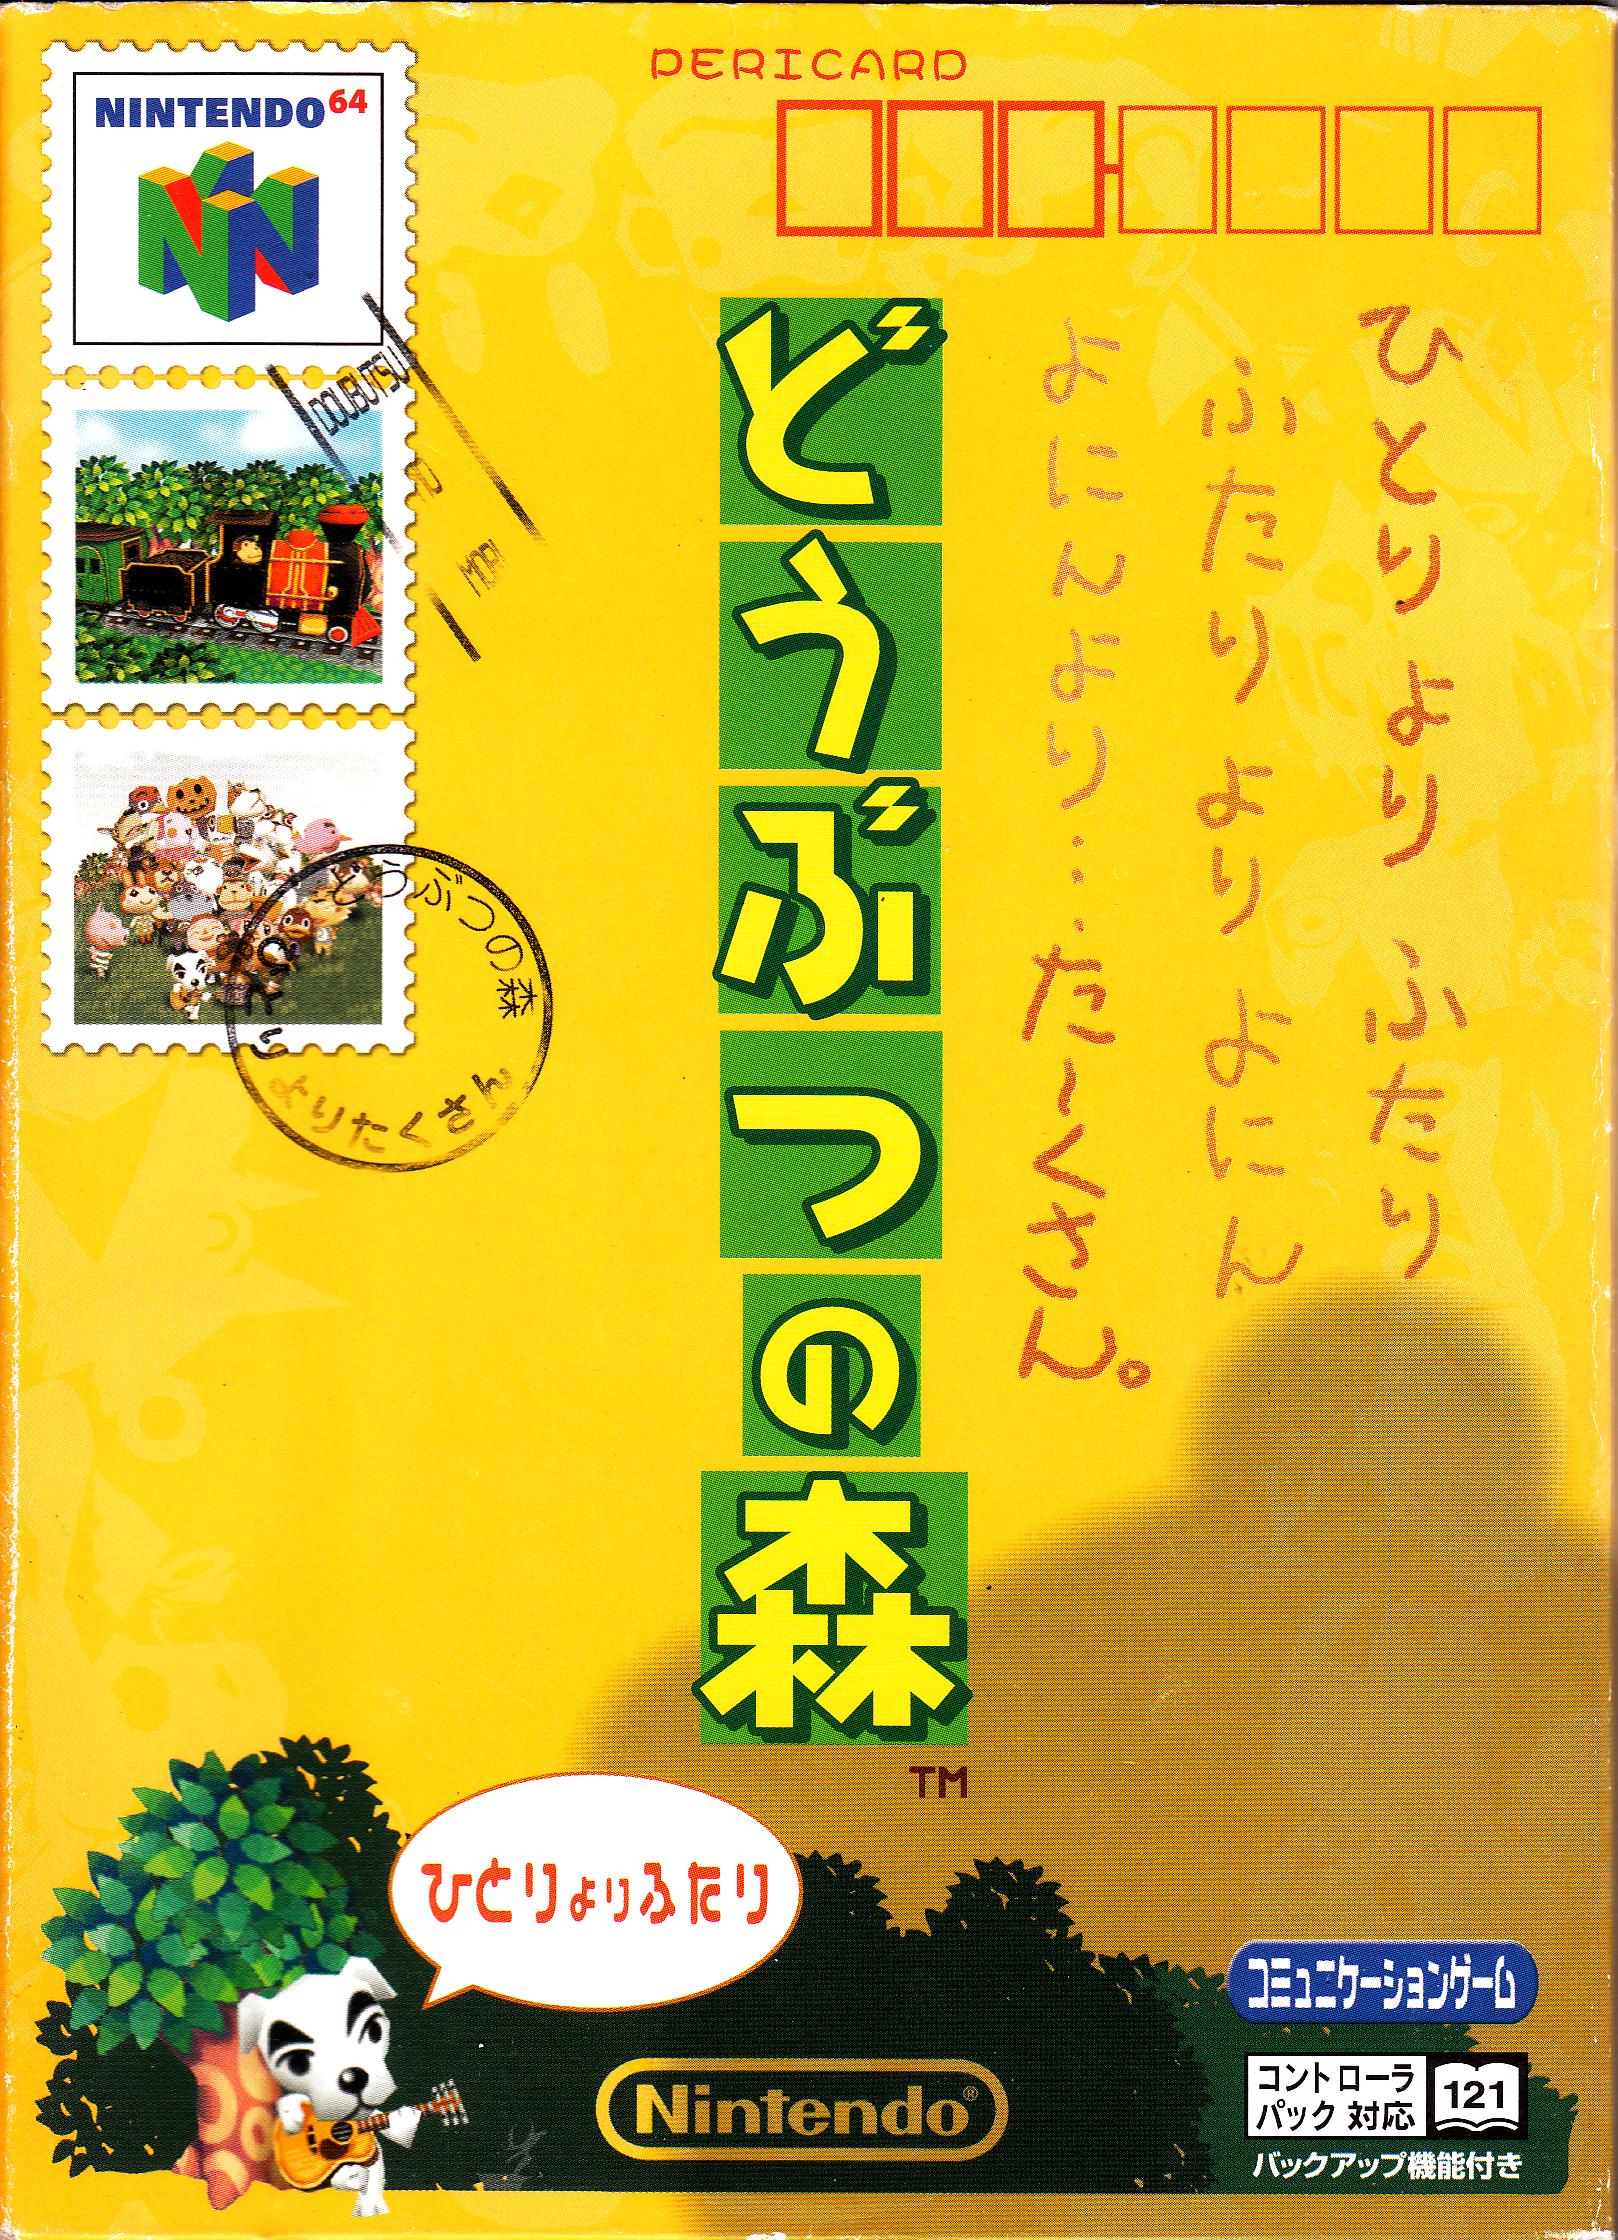 Dōbutsu no Mori (game) | Animal Crossing Wiki | FANDOM powered by Wikia